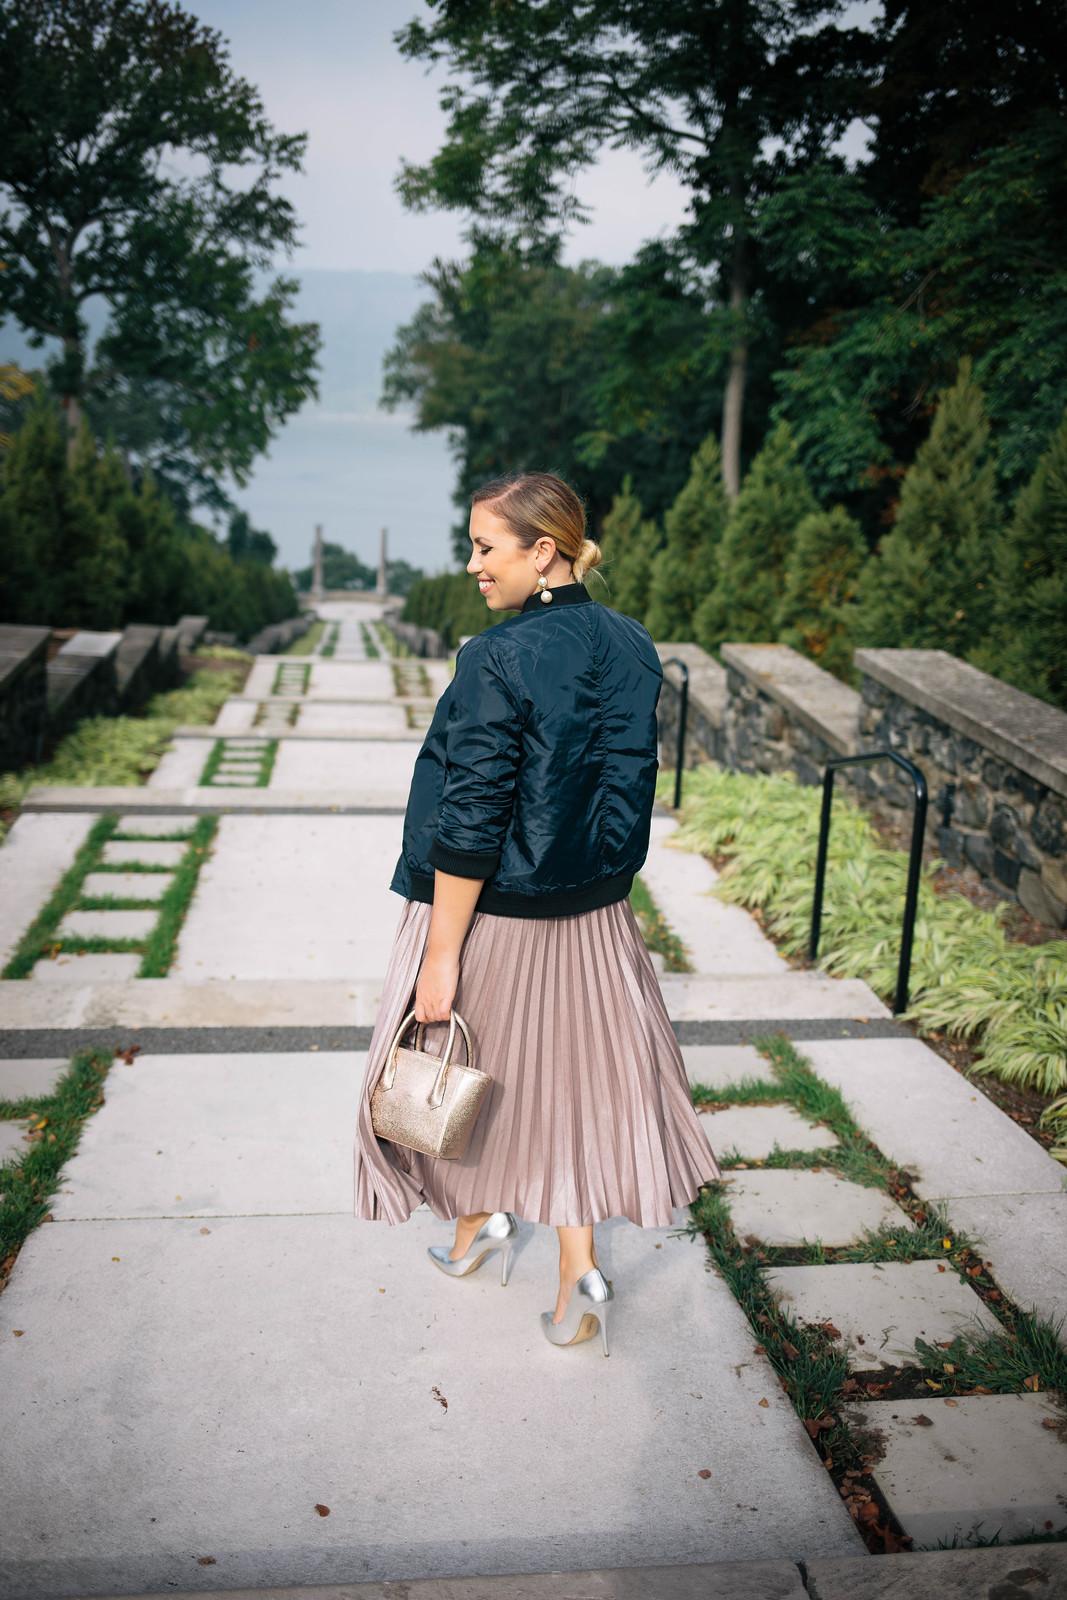 Navy Bomber Jacket | Metallic Pleated Midi Skirt | Silver High Heels | Untermeyer Park & Gardens Yonkers NY